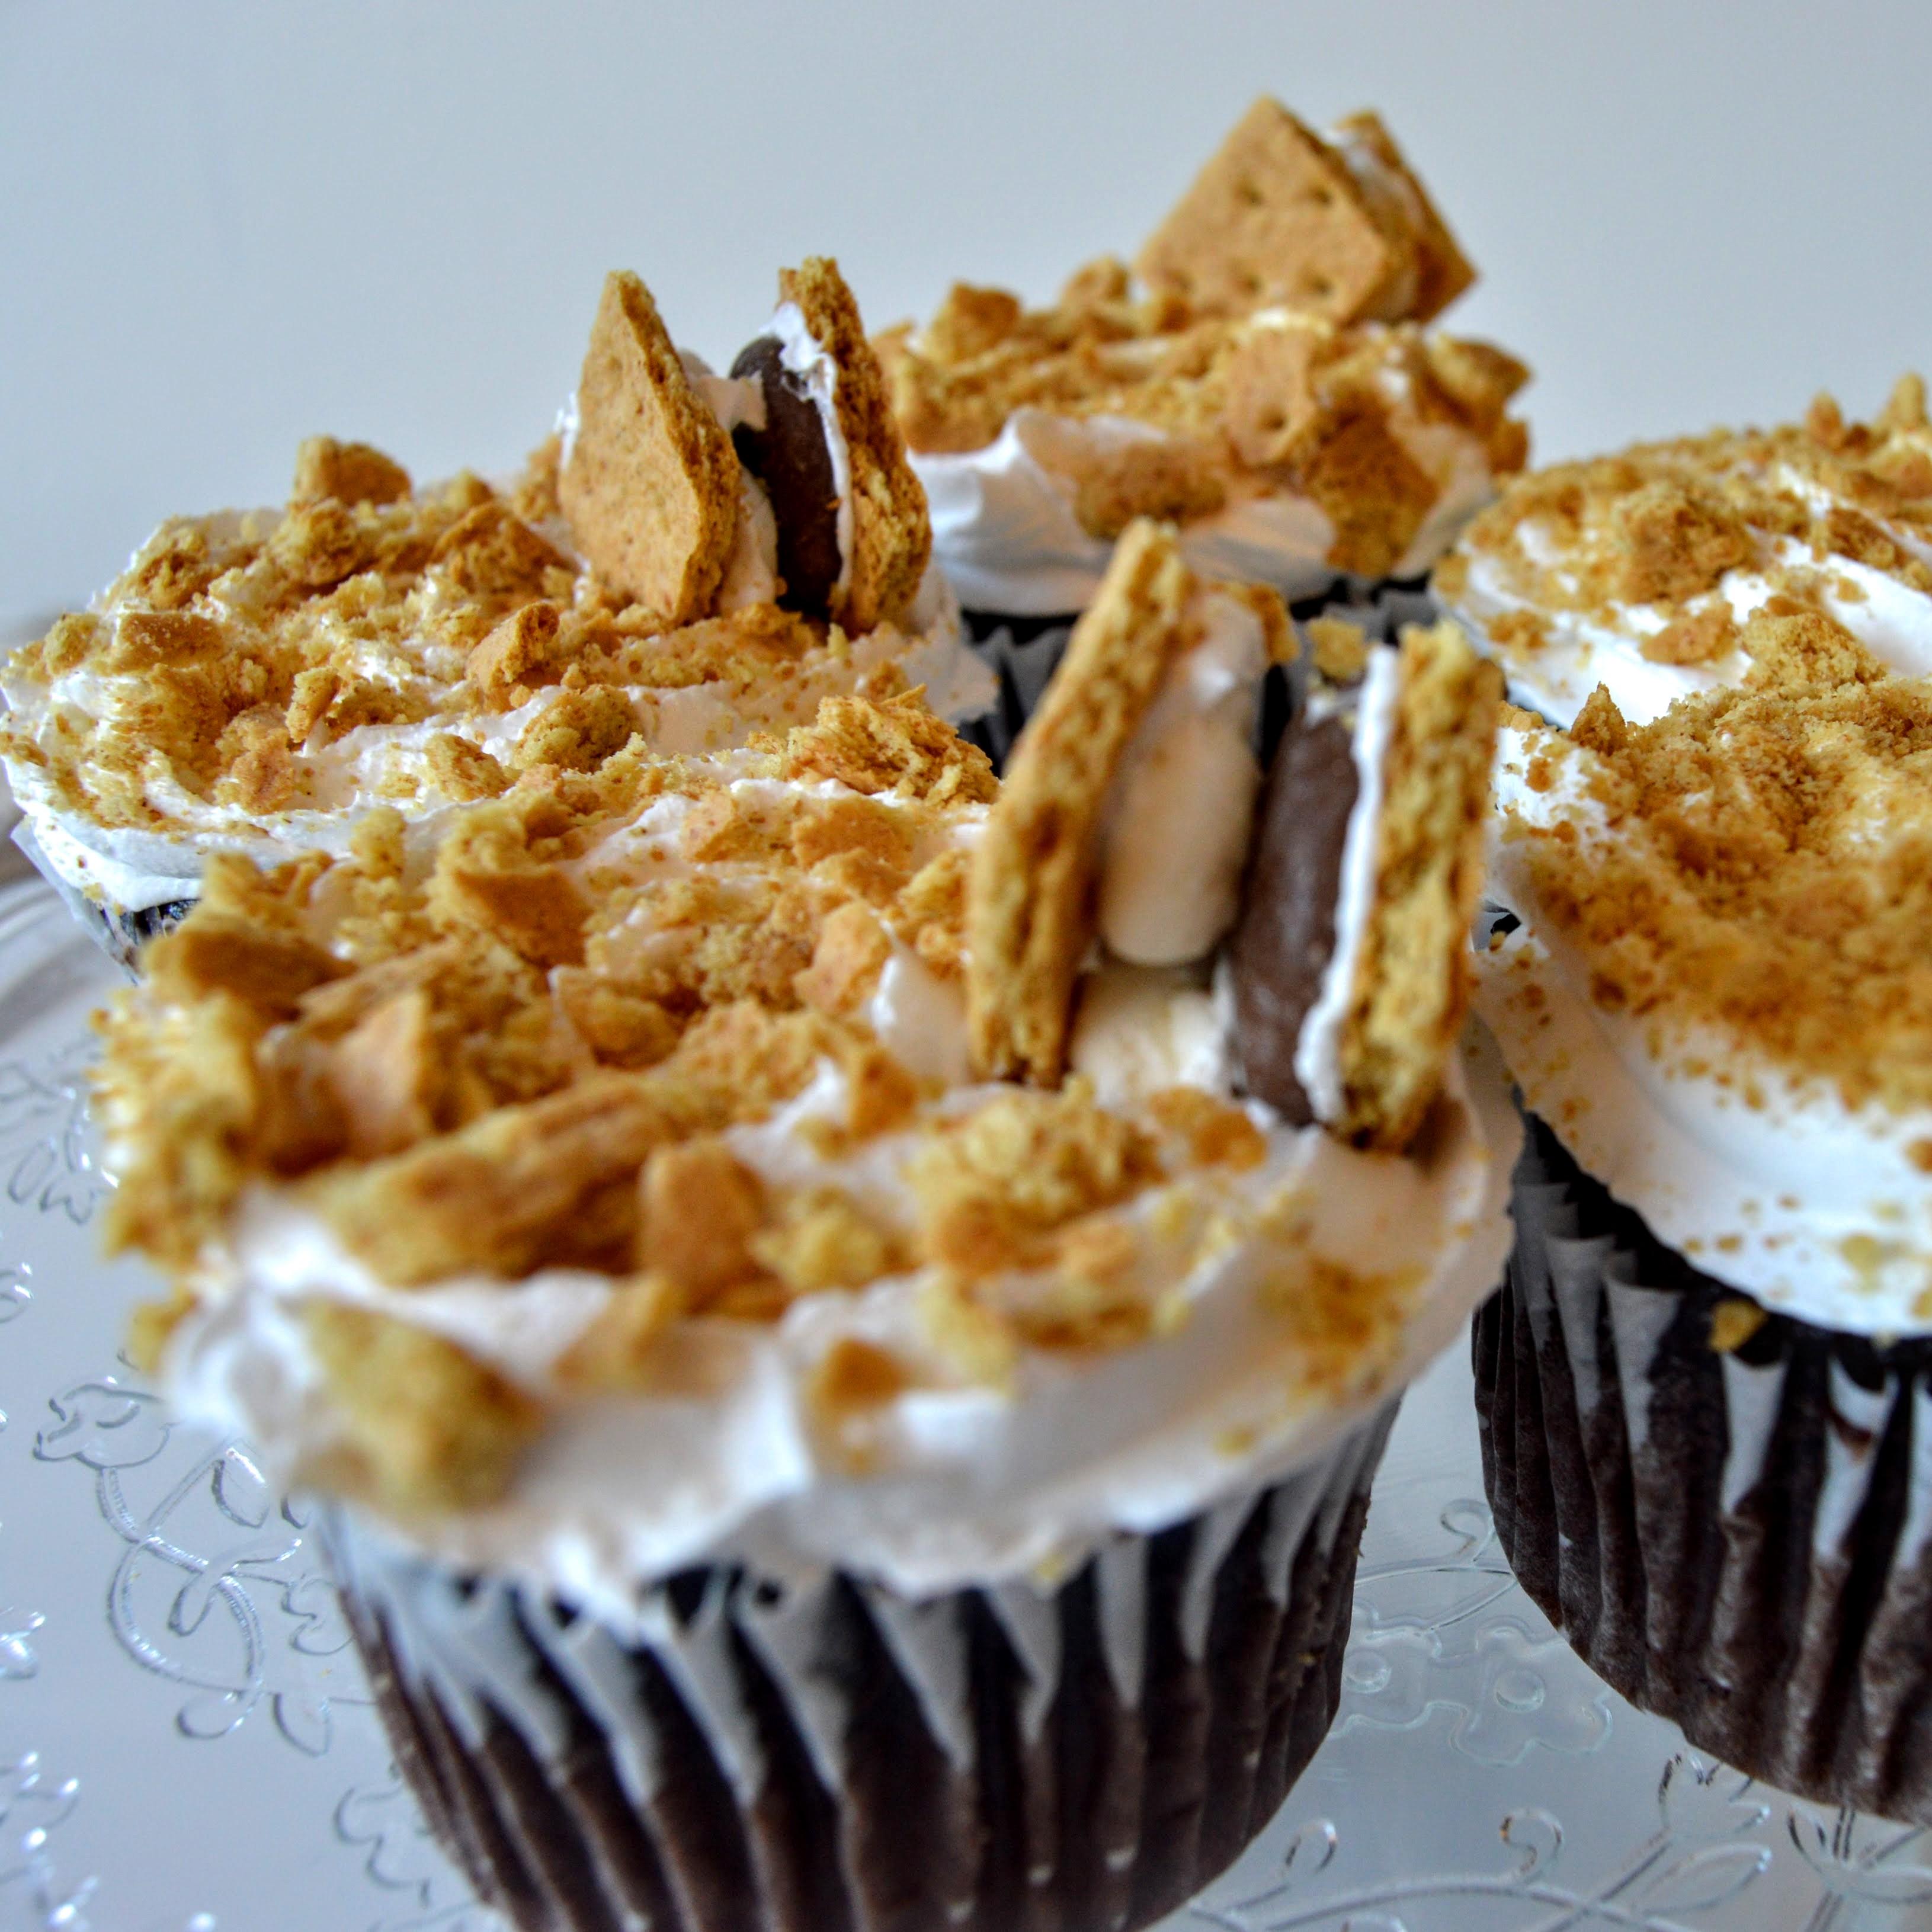 s'more cupcakes by faronda davis